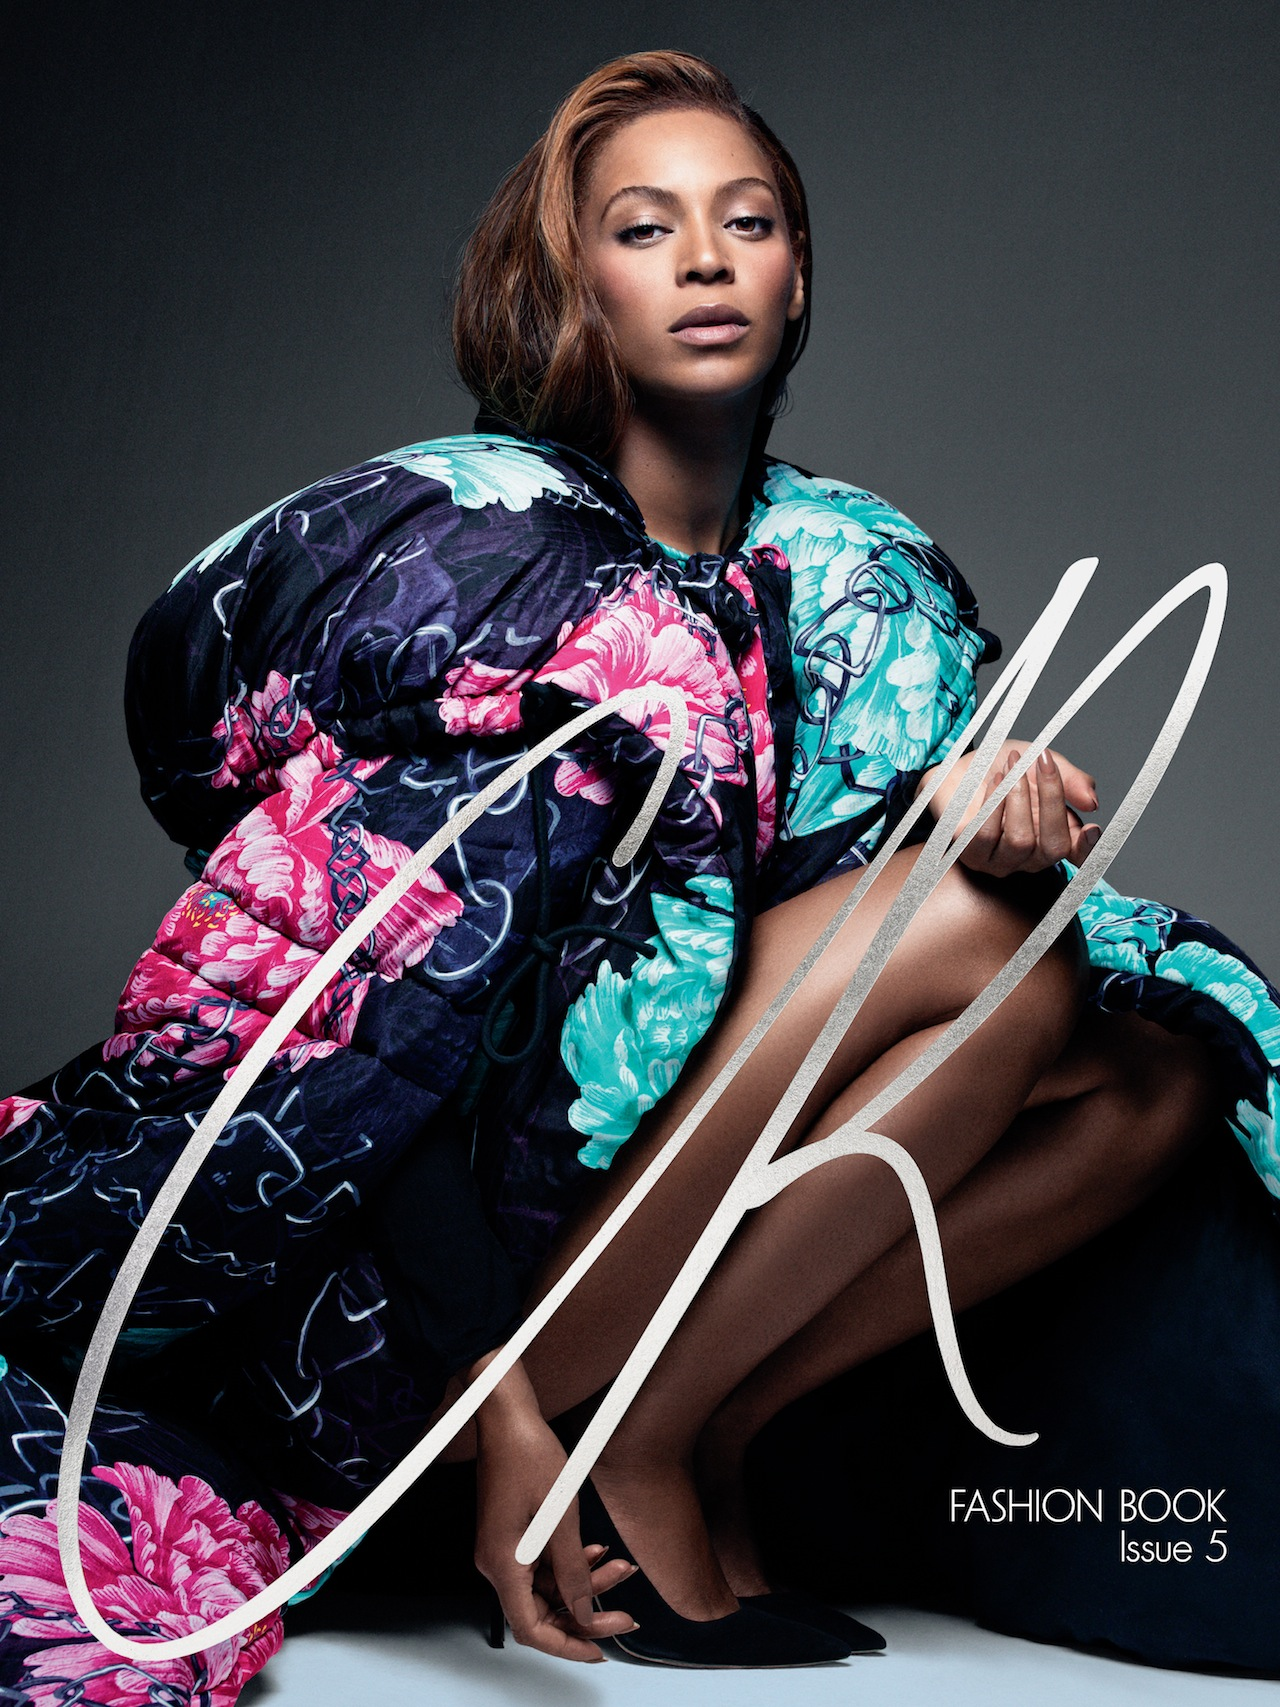 Image: C.R. Fashion Book